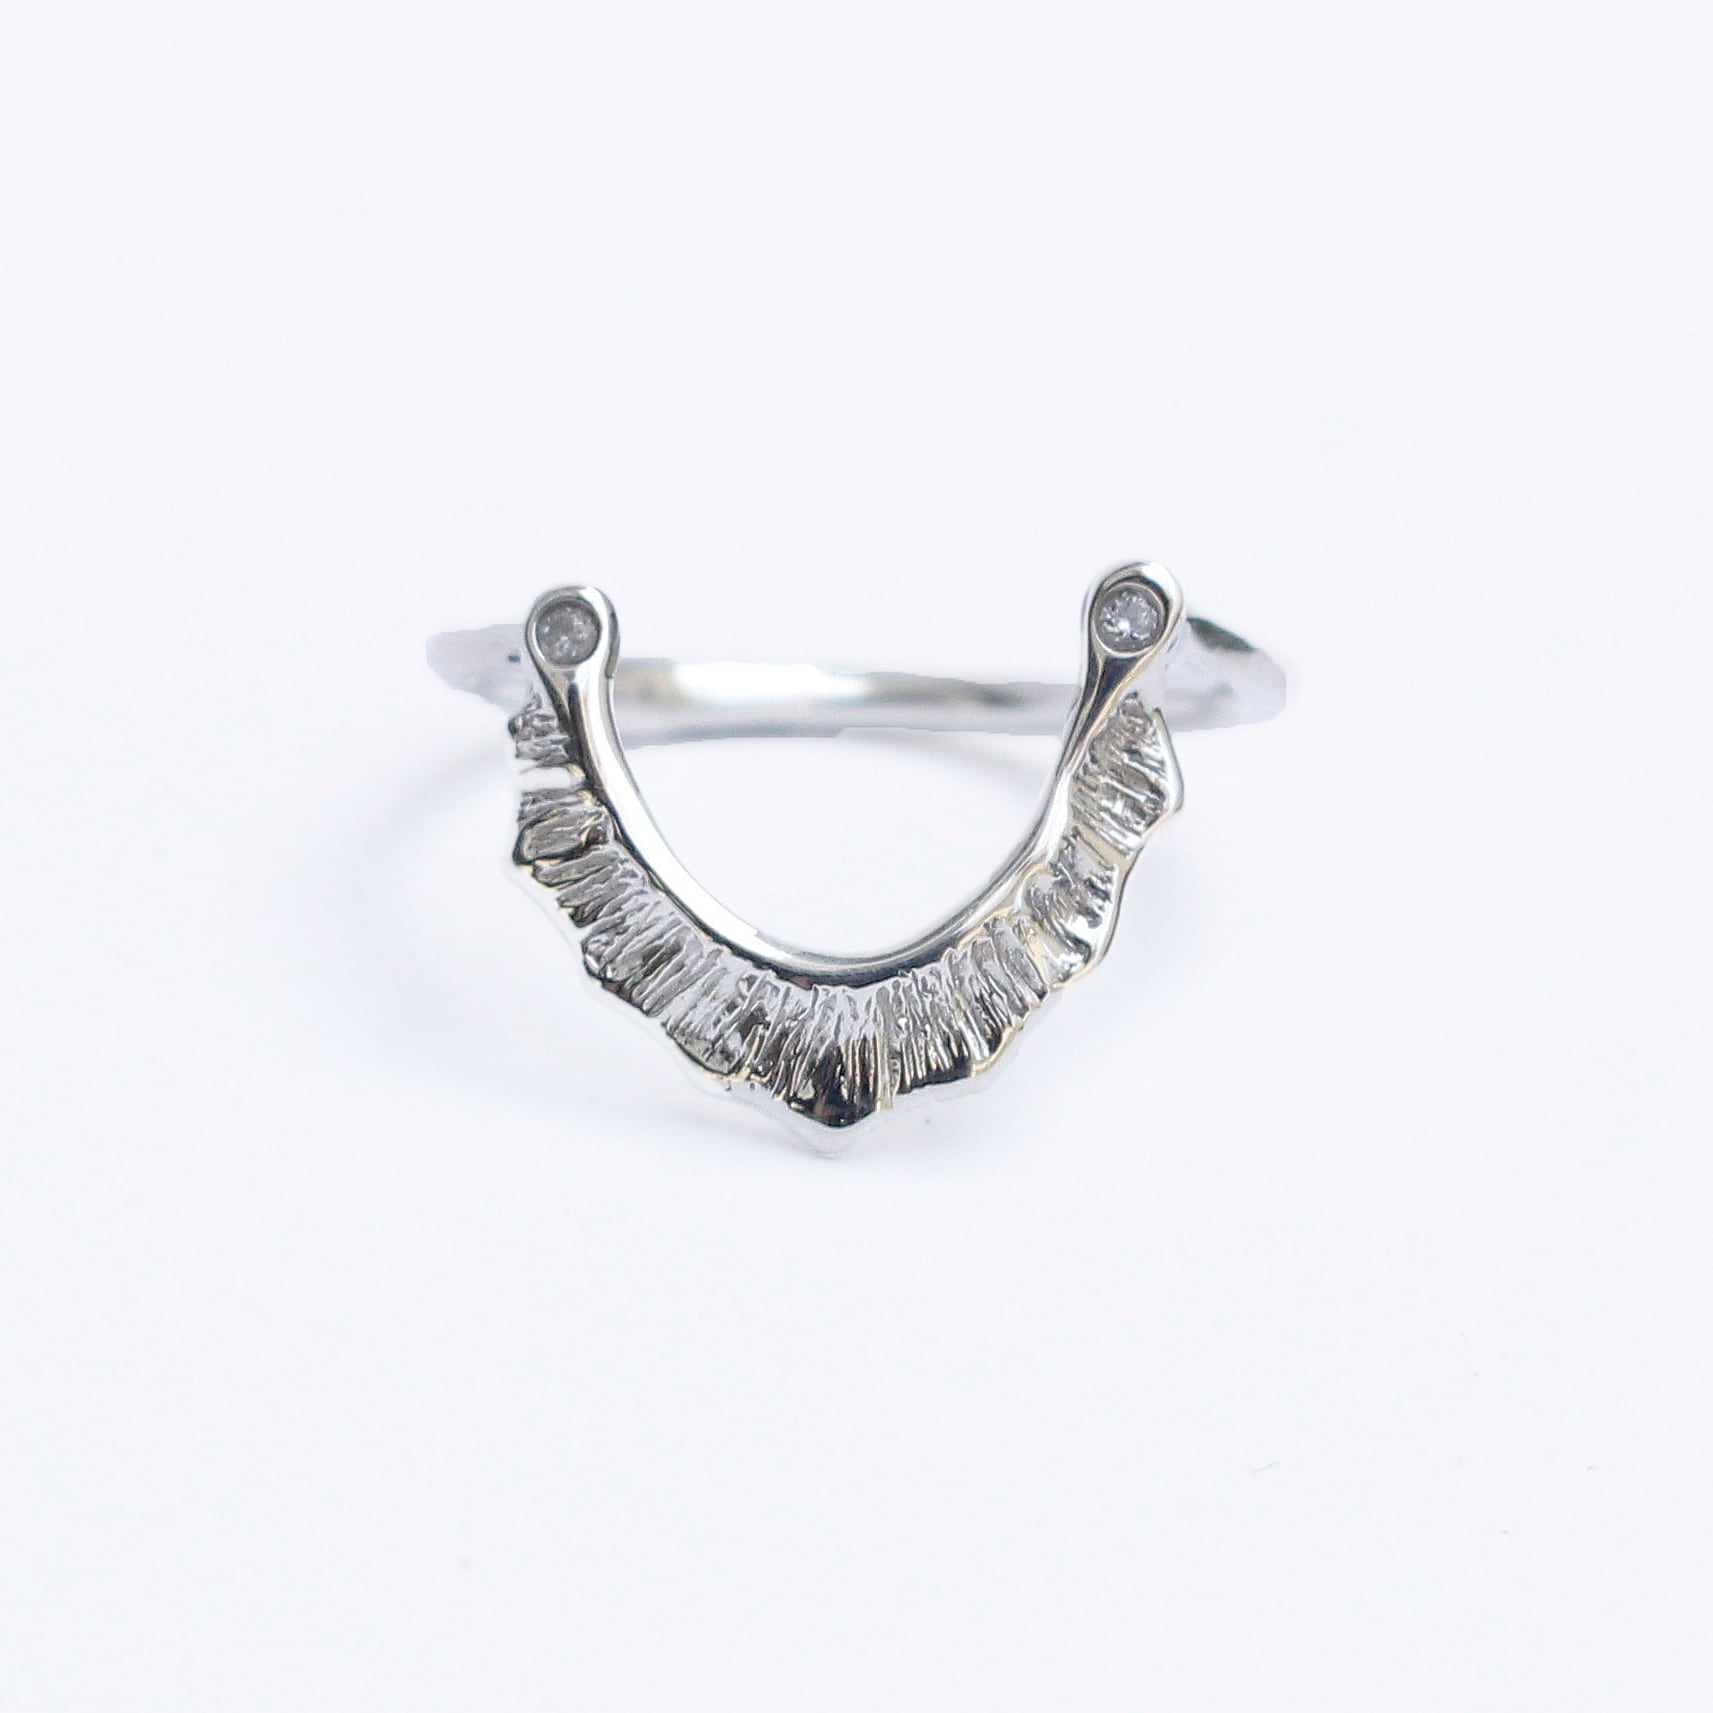 conoa (コノア) あまだれの指飾り silver